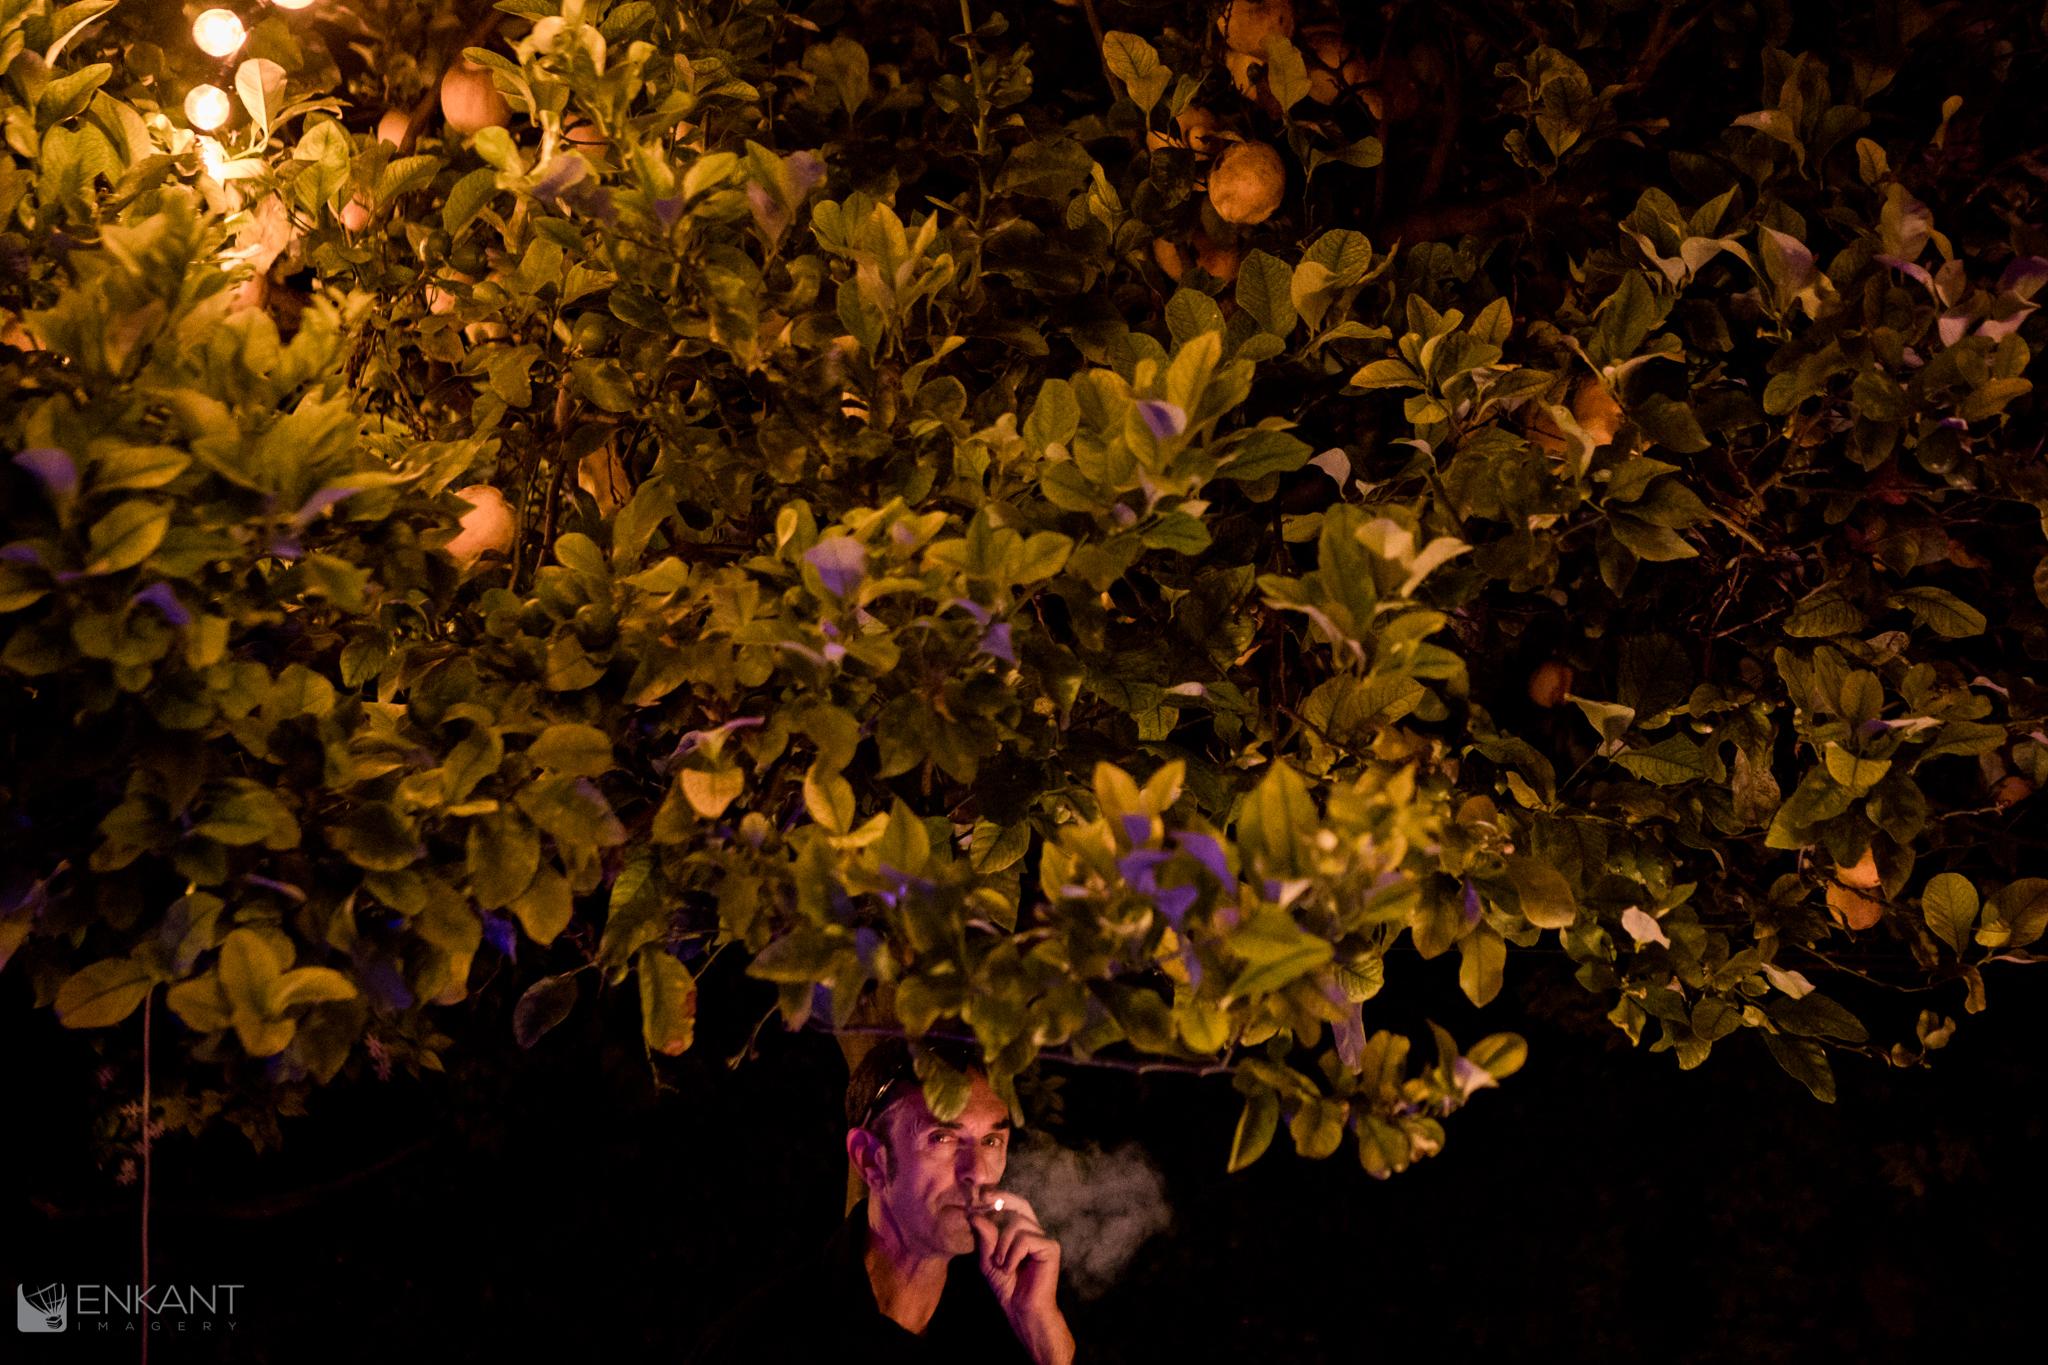 Fotografo matrimonio Sicilia - enkant Imagery-56.jpg